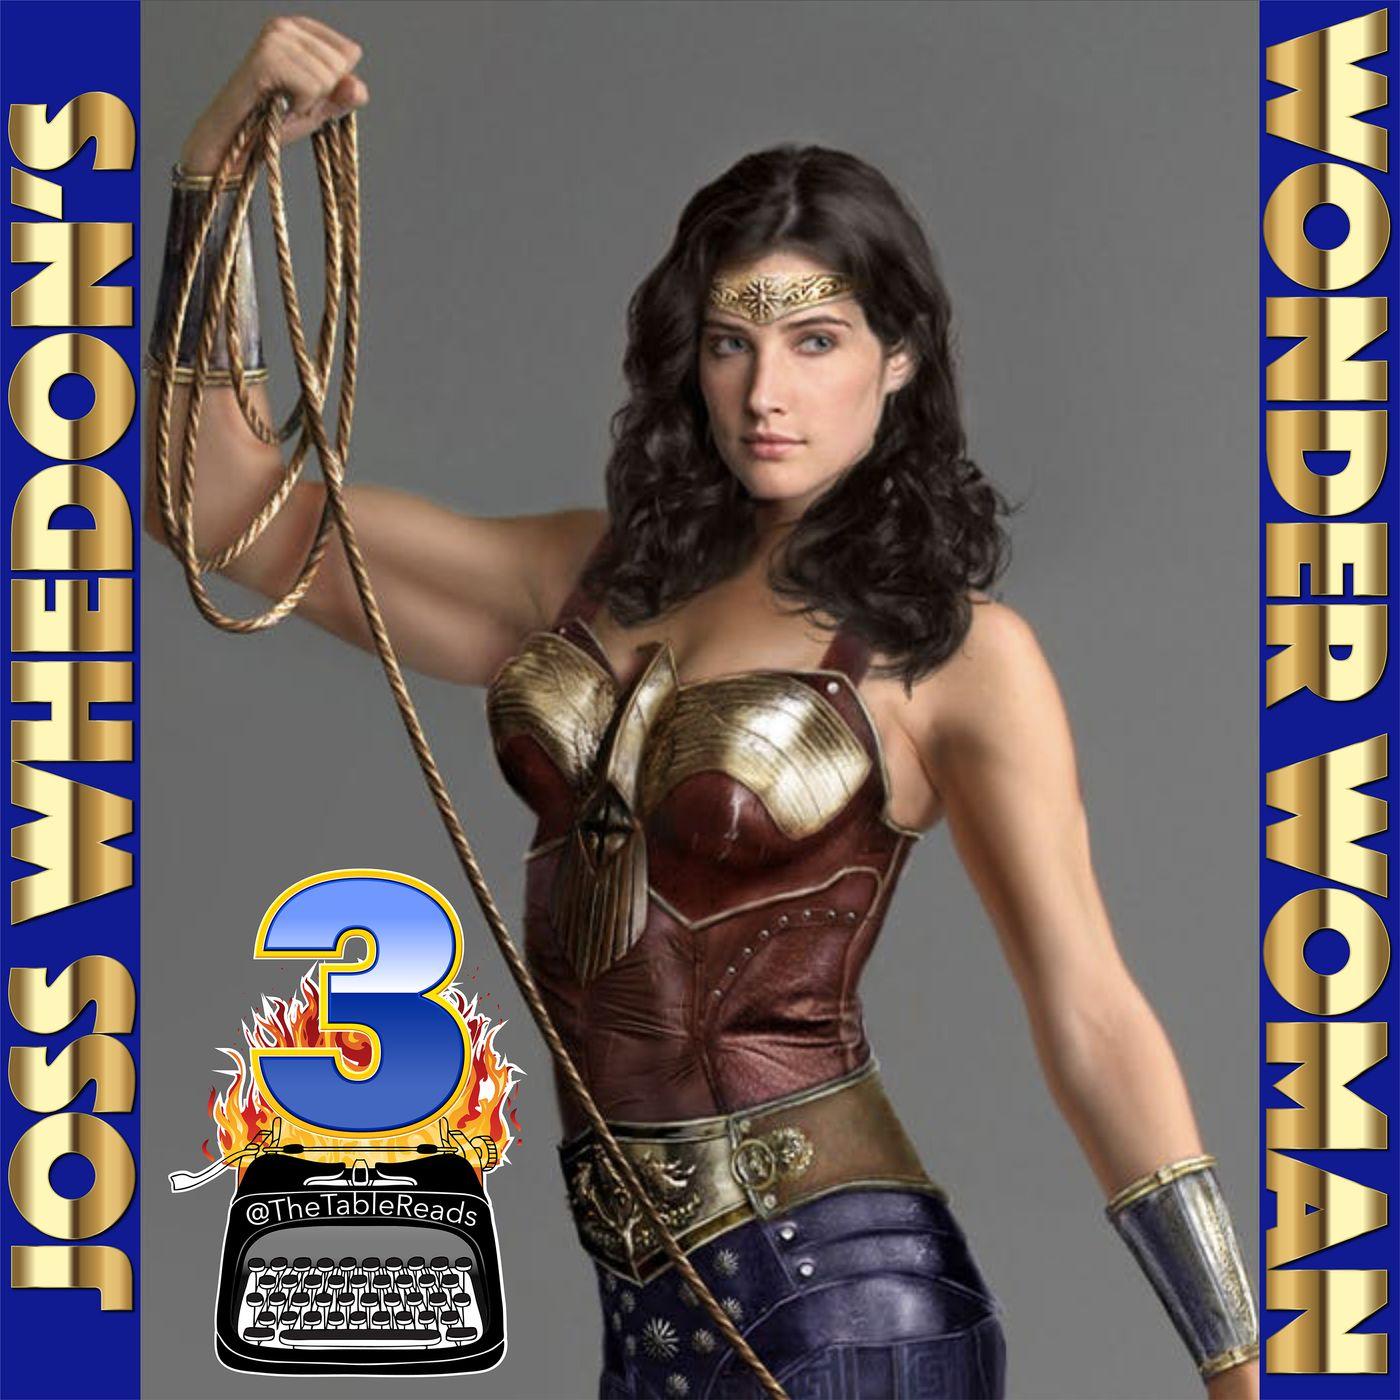 89 - Joss Whedon's Wonder Woman, Part 3